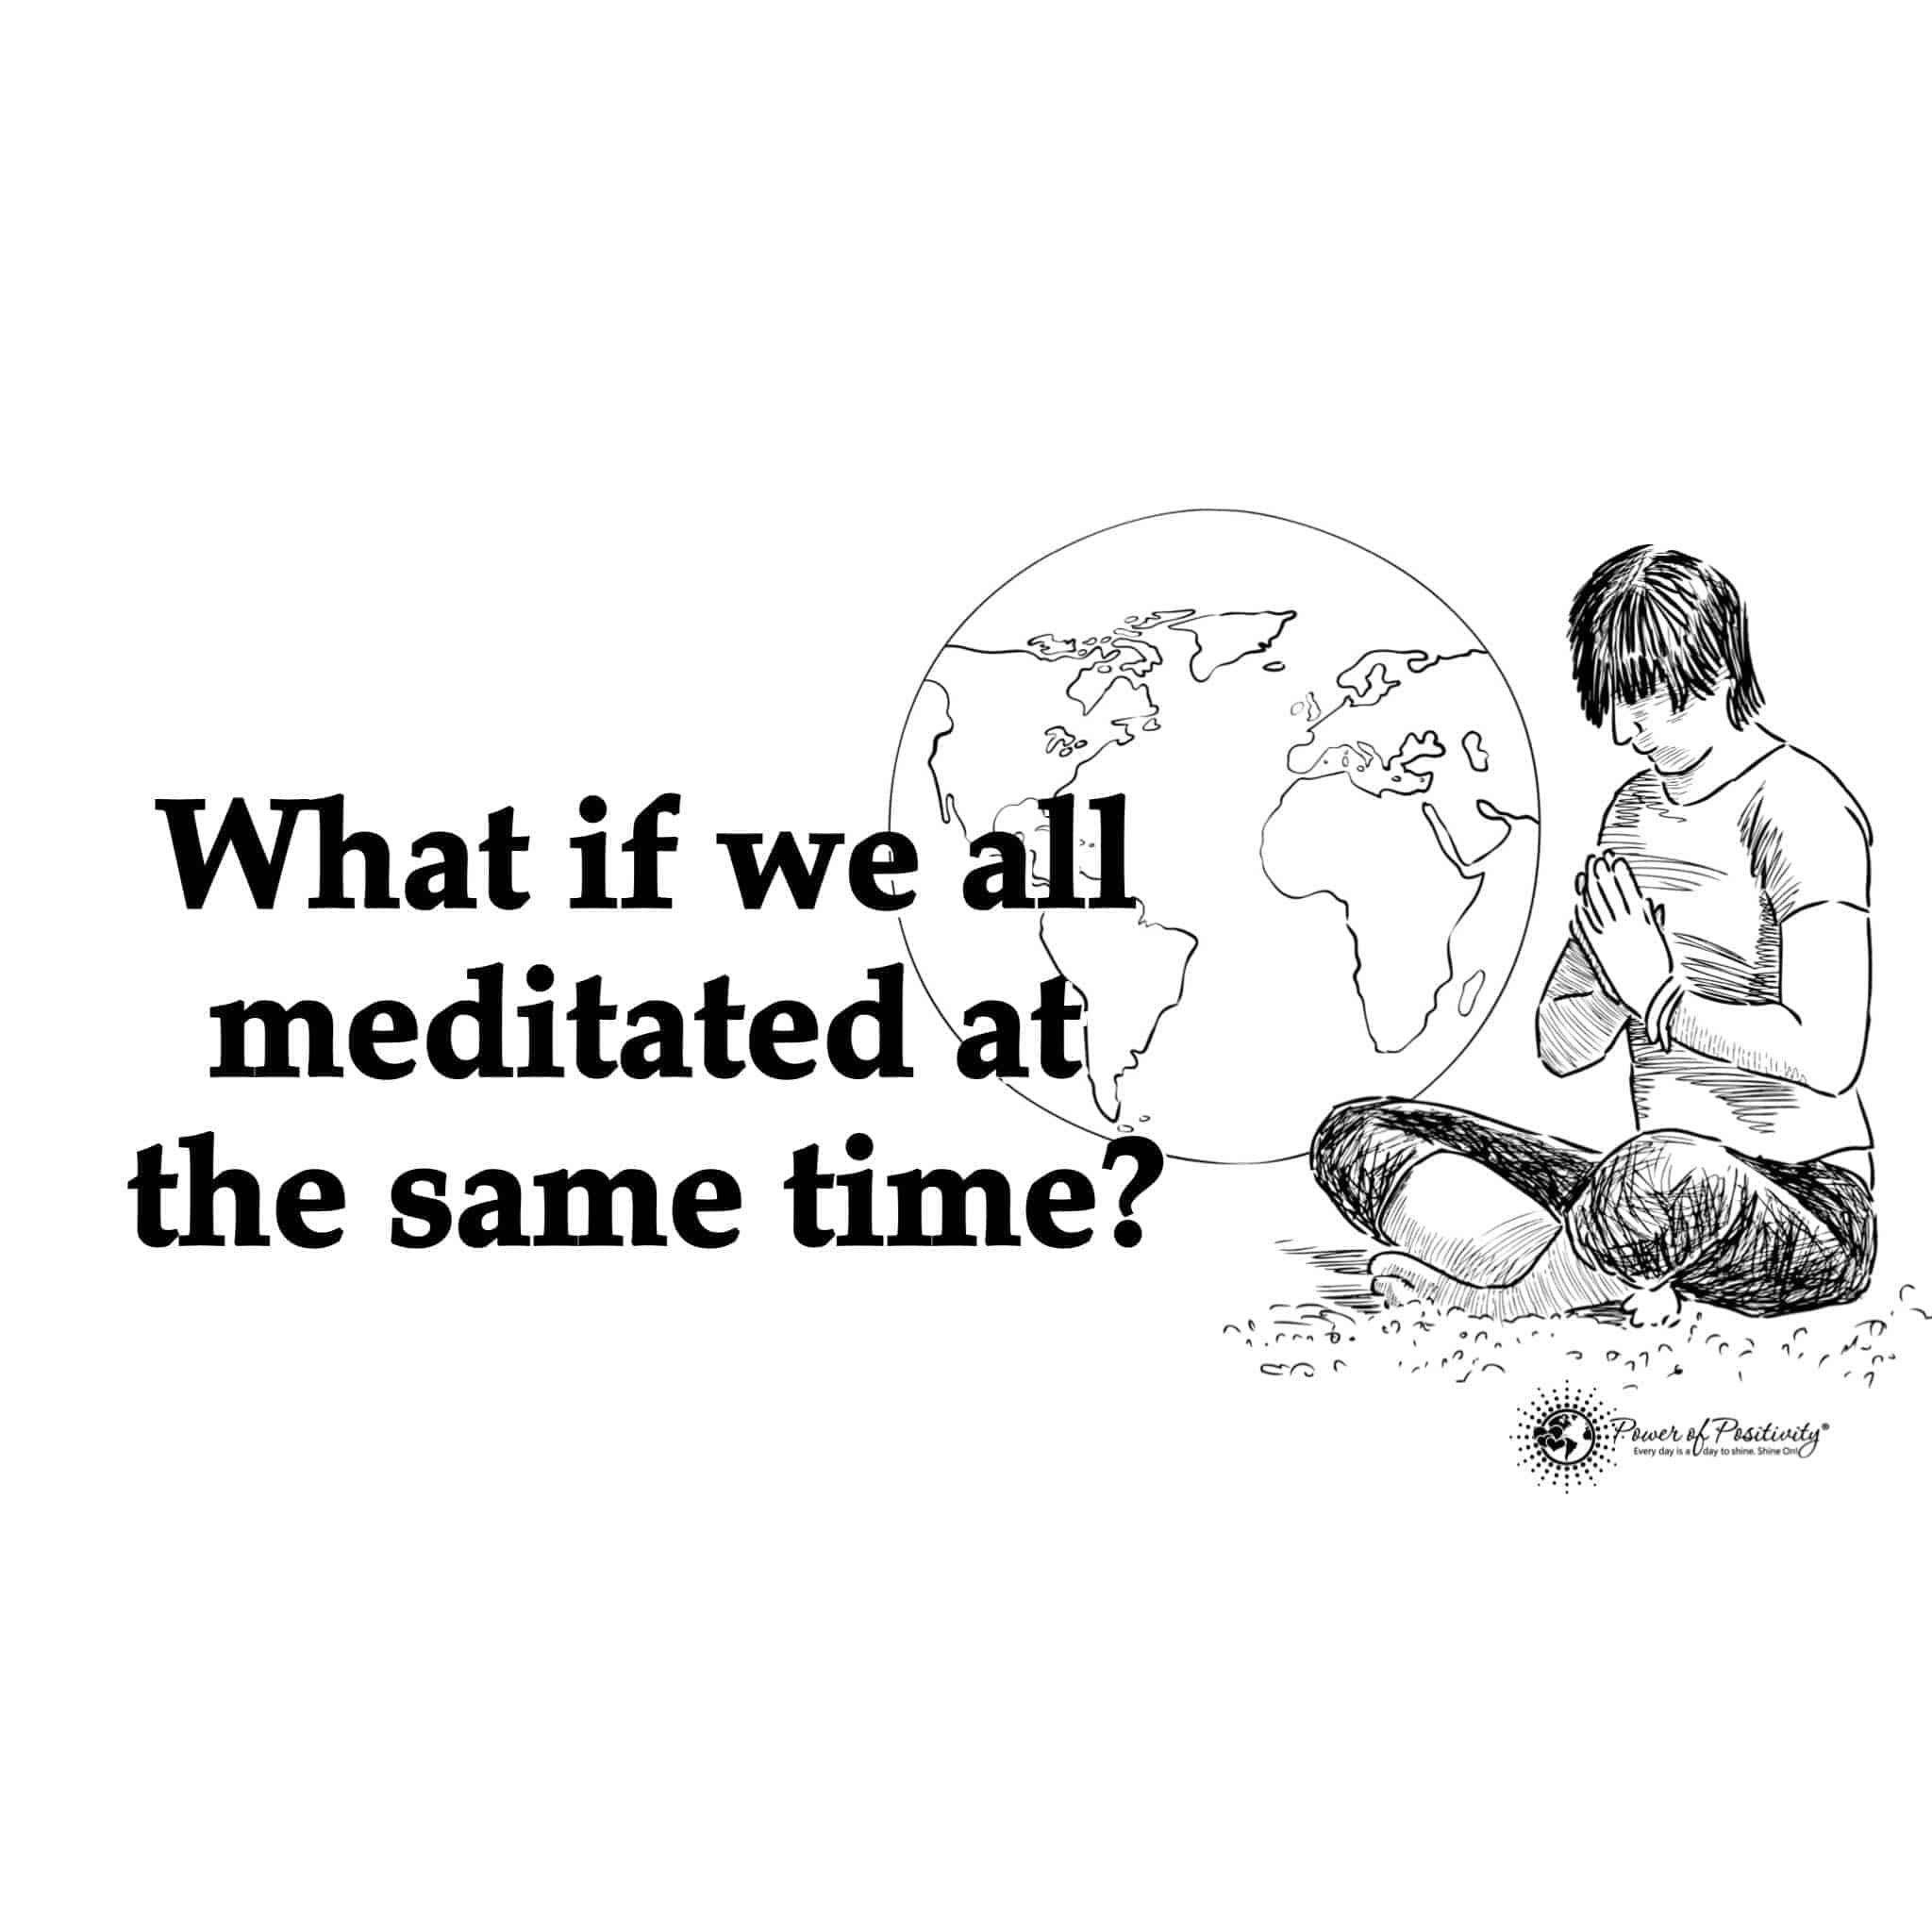 meditated